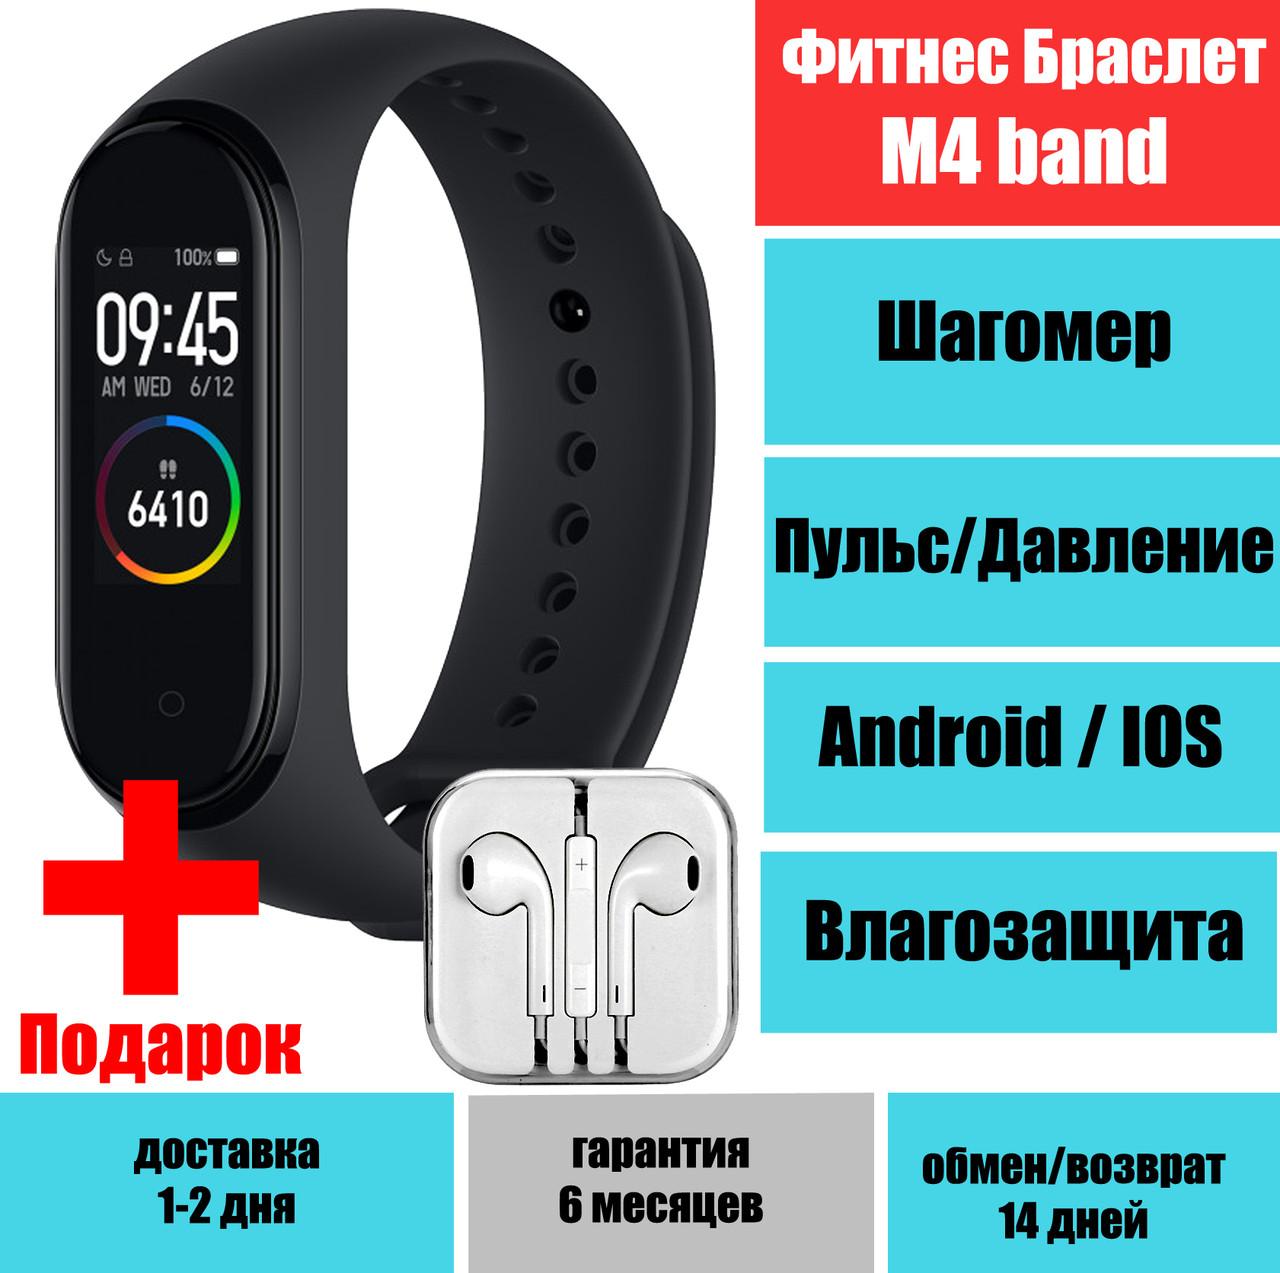 Фитнес браслет Xiaomi Mi Band 4  M4 band QualitiReplica реплика